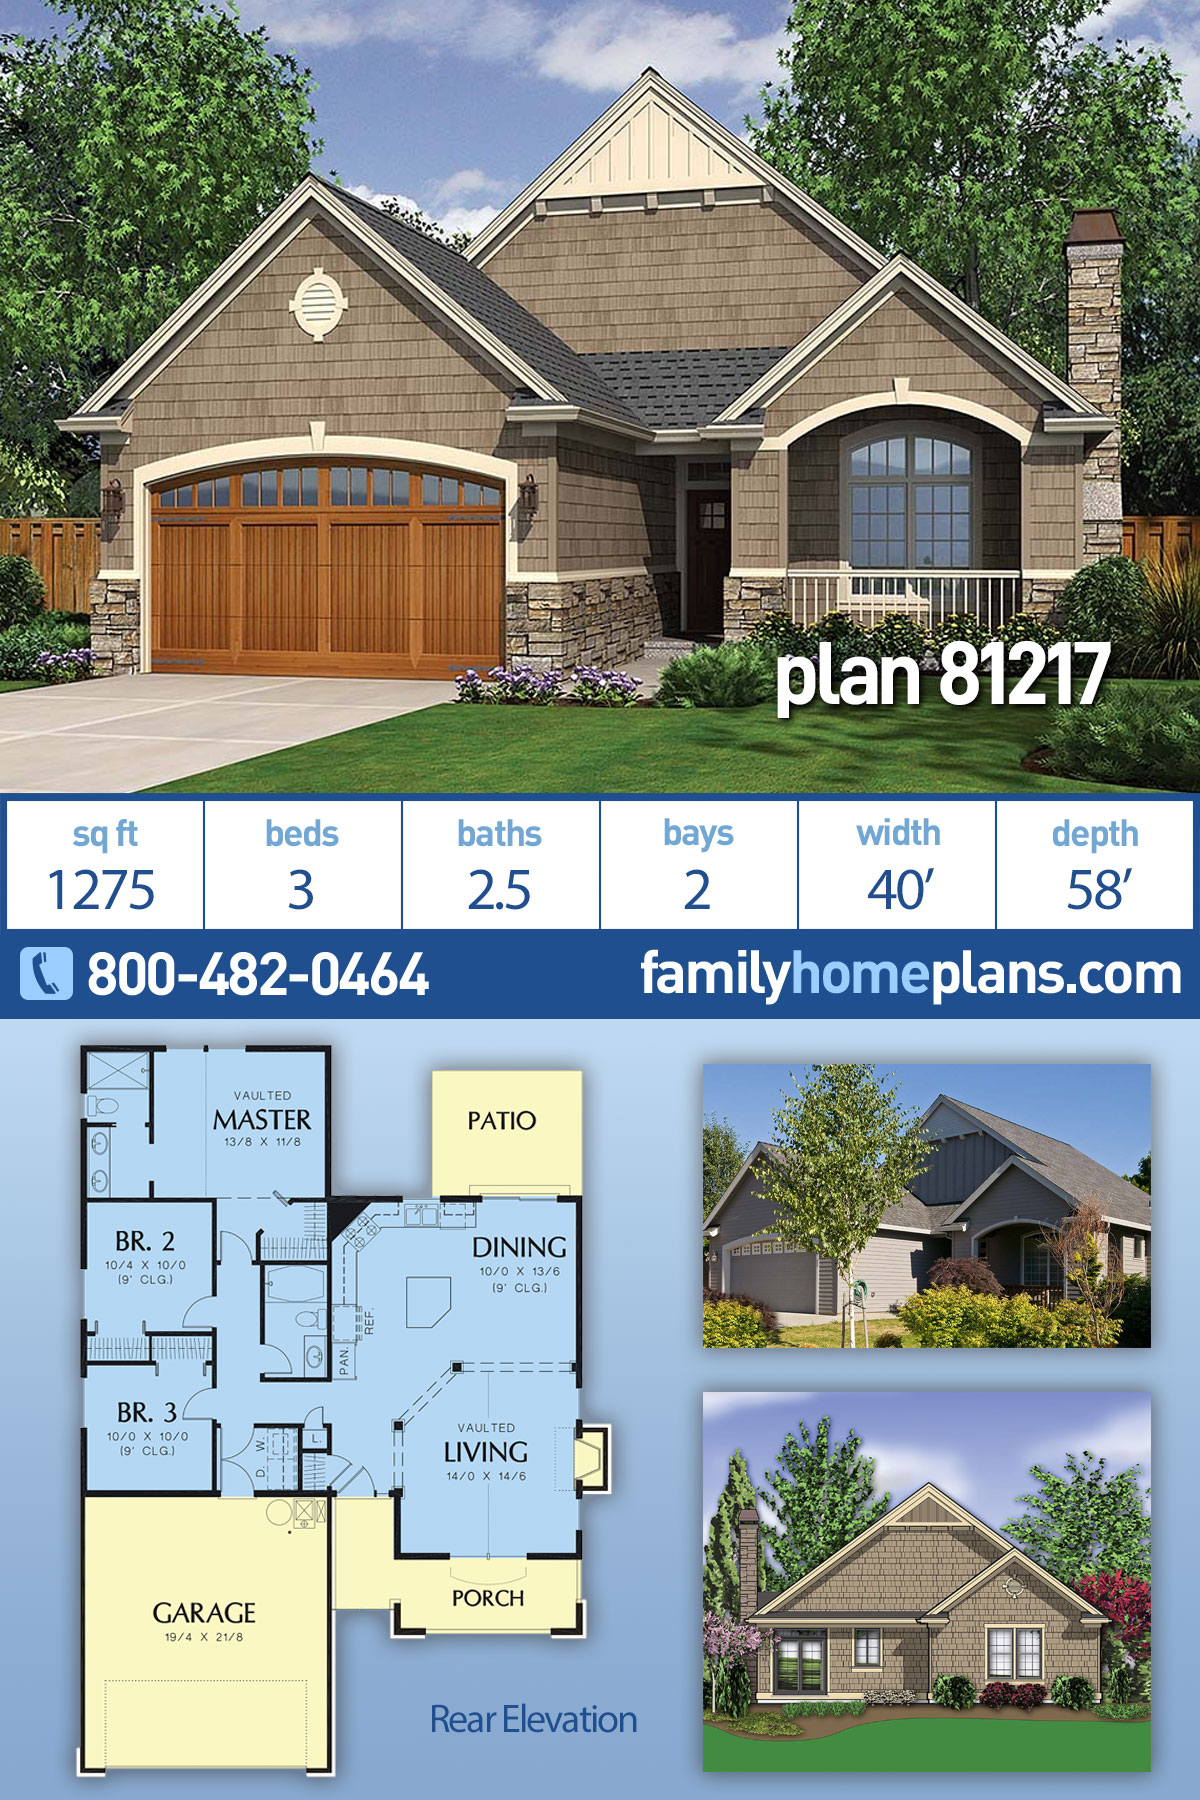 Cottage, Craftsman House Plan 81217 with 3 Beds, 3 Baths, 2 Car Garage